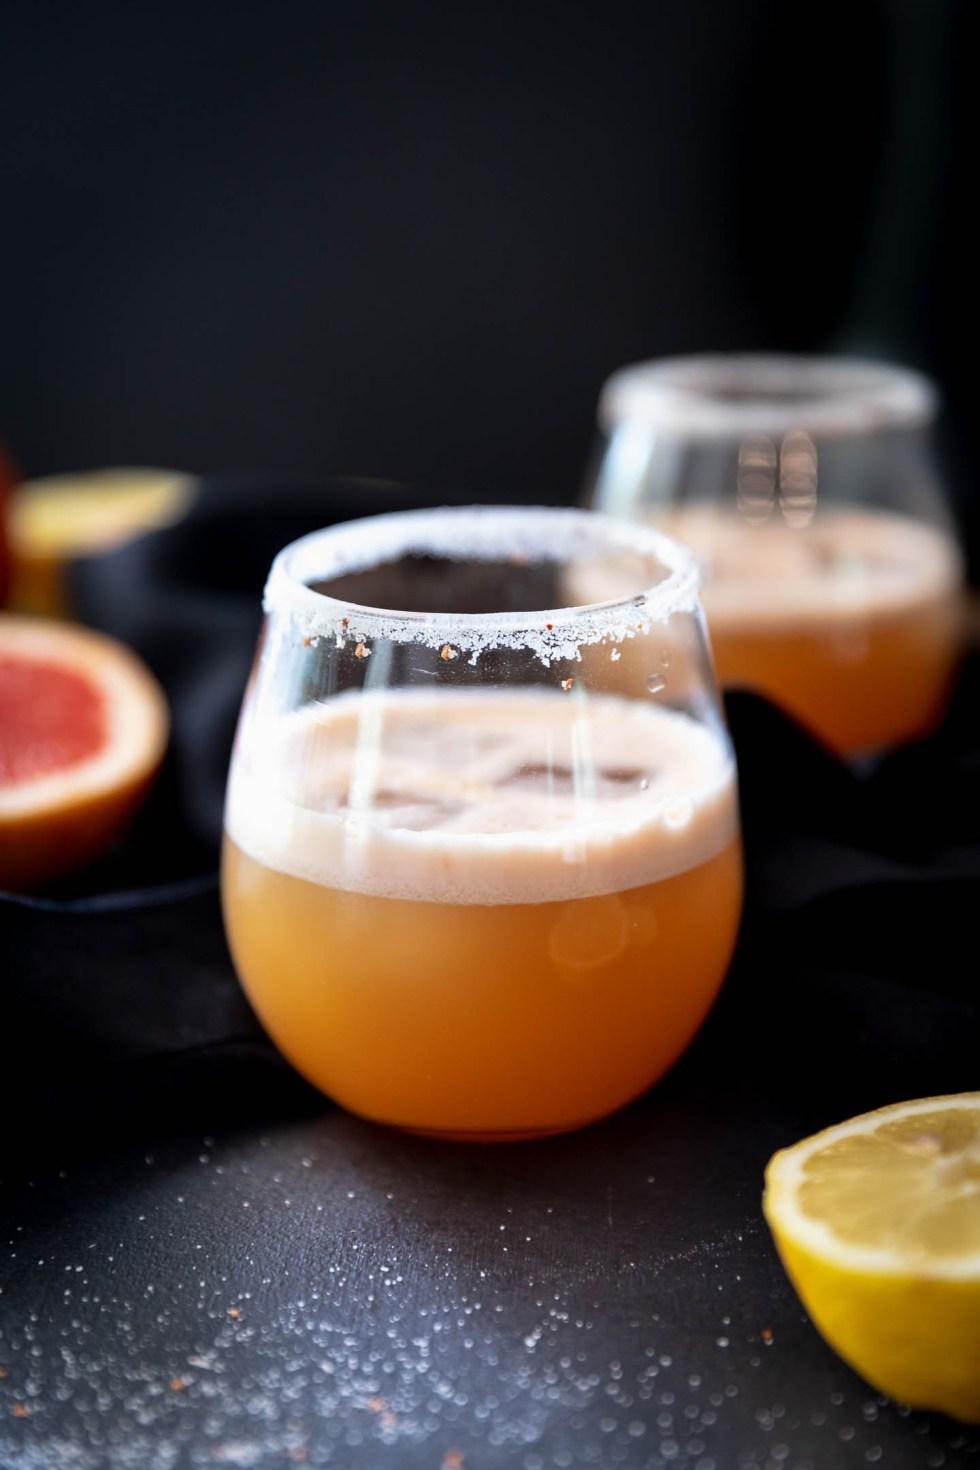 Stemless wine glass with grapefruit margarita and a tajin sugar rim